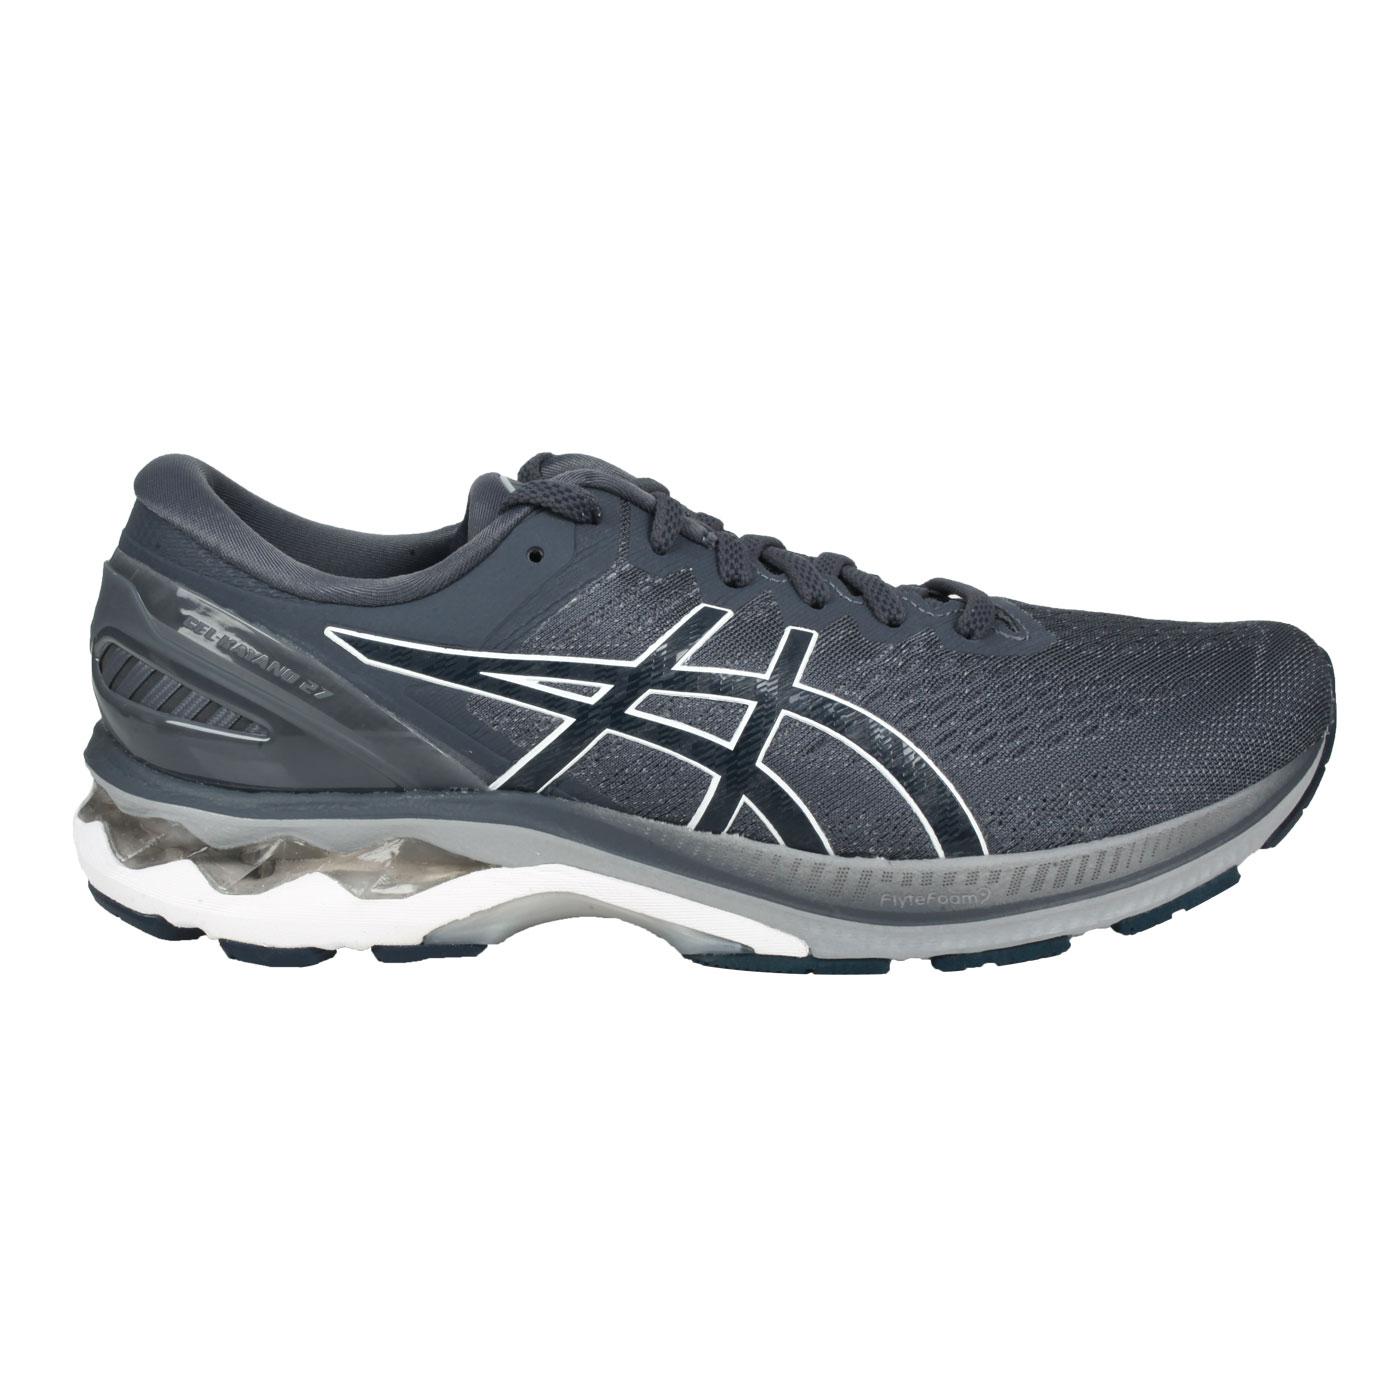 ASICS 男款慢跑鞋  @GEL-KAYANO 27@1011A767-023 - 深墨灰白